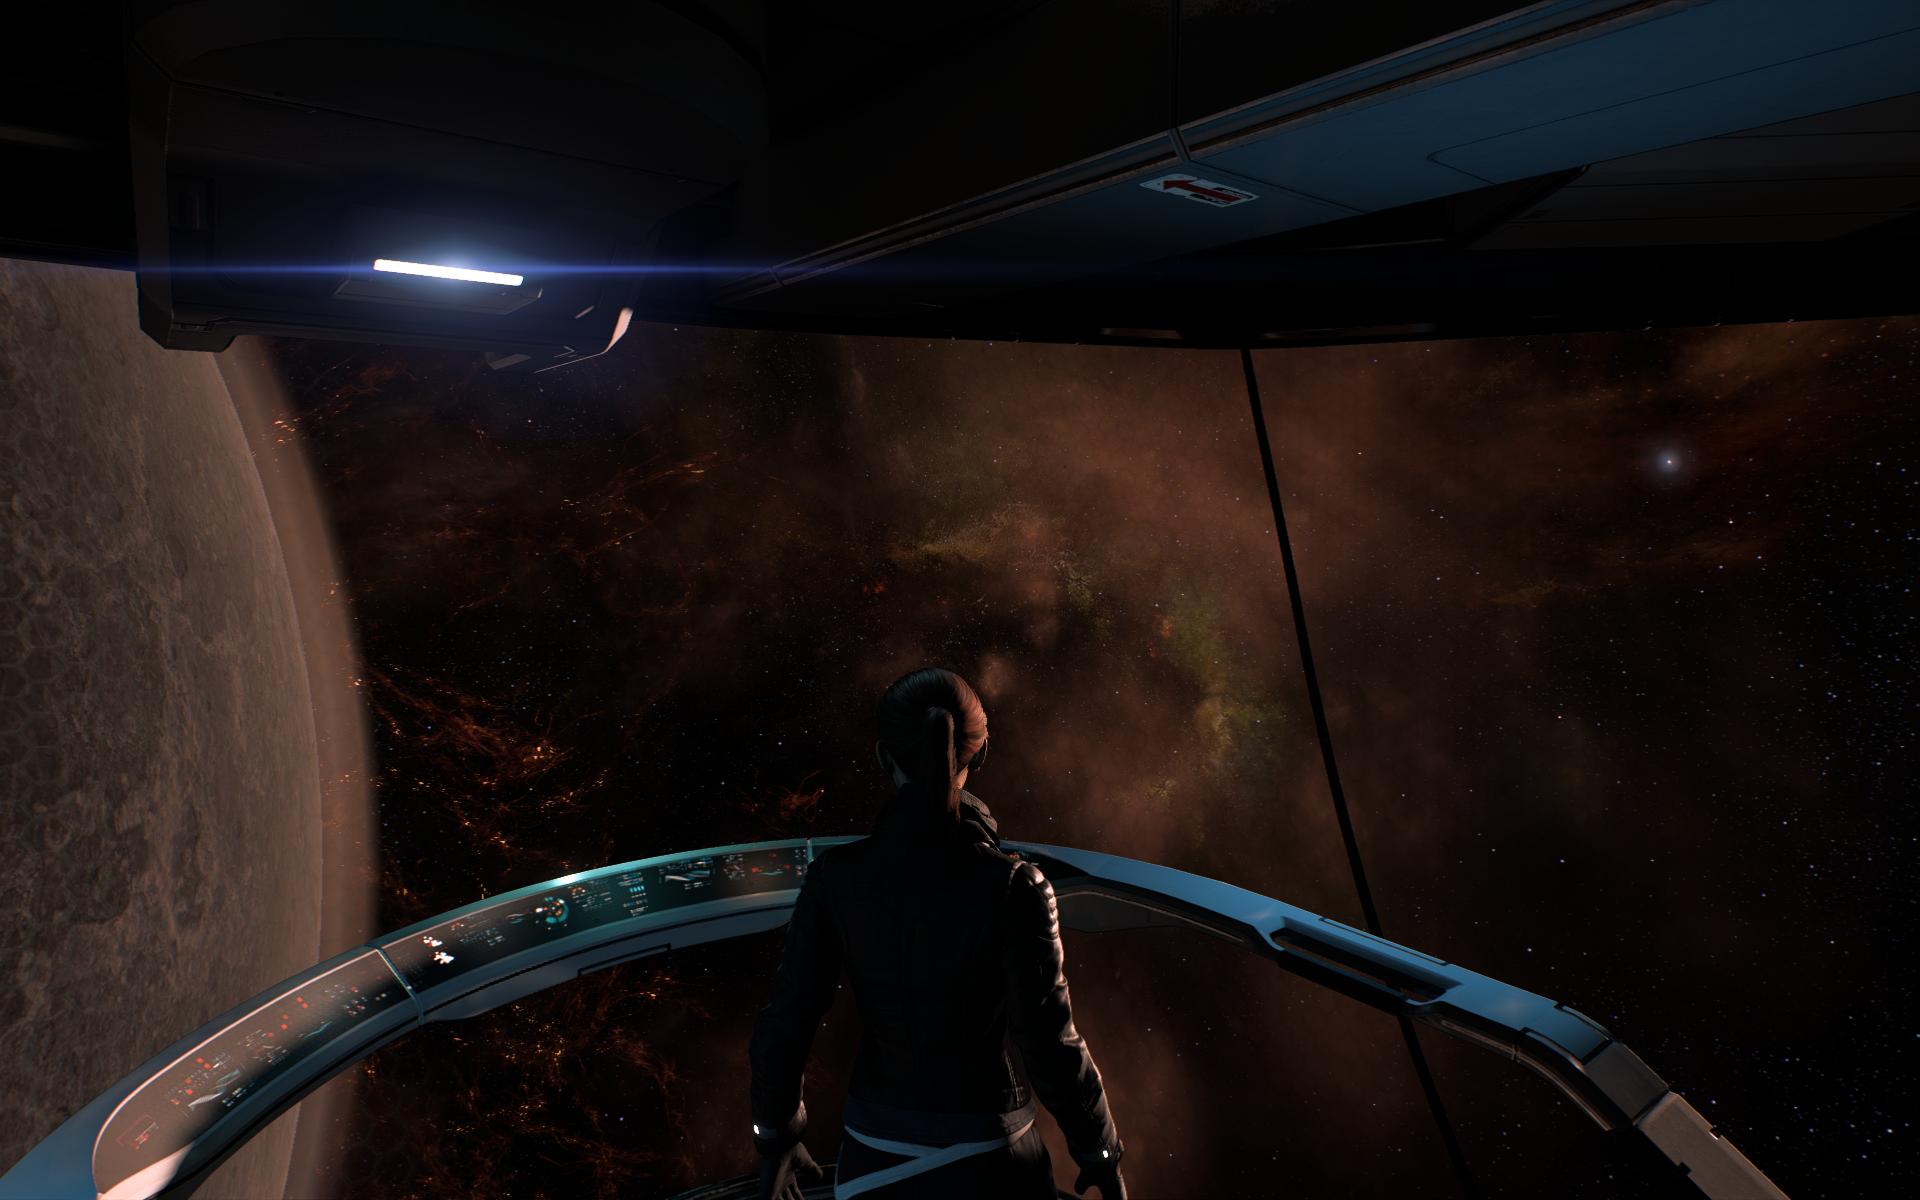 Mass Effect Andromeda Screenshot  - 23.01.43.63.png - Mass Effect: Andromeda